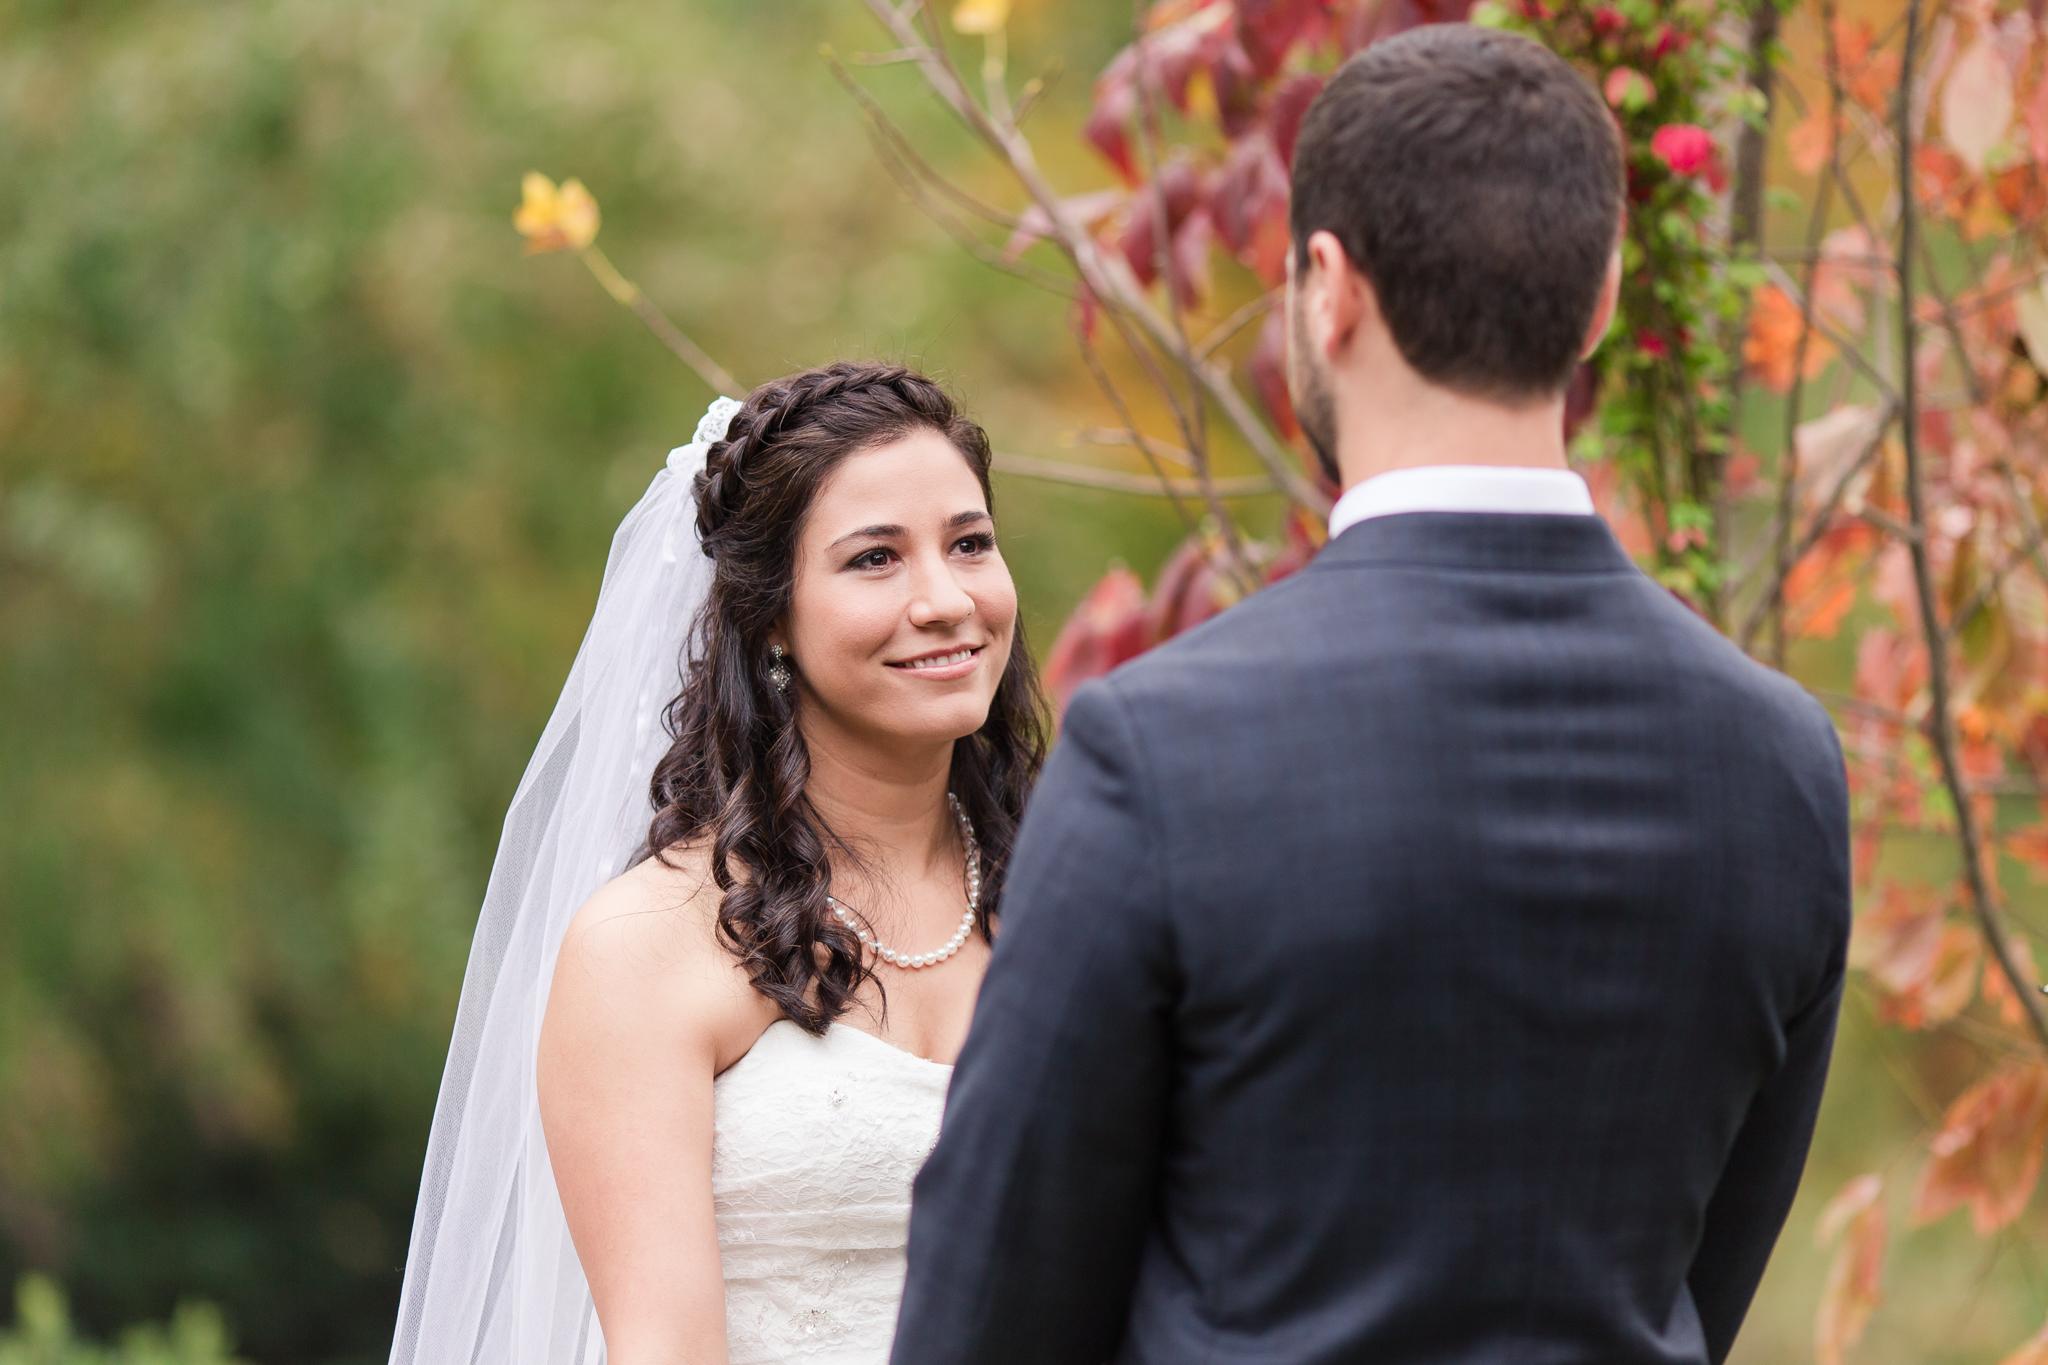 Ashley-Amber-Photo-Outdoor-Wedding-Photography-164515.jpg